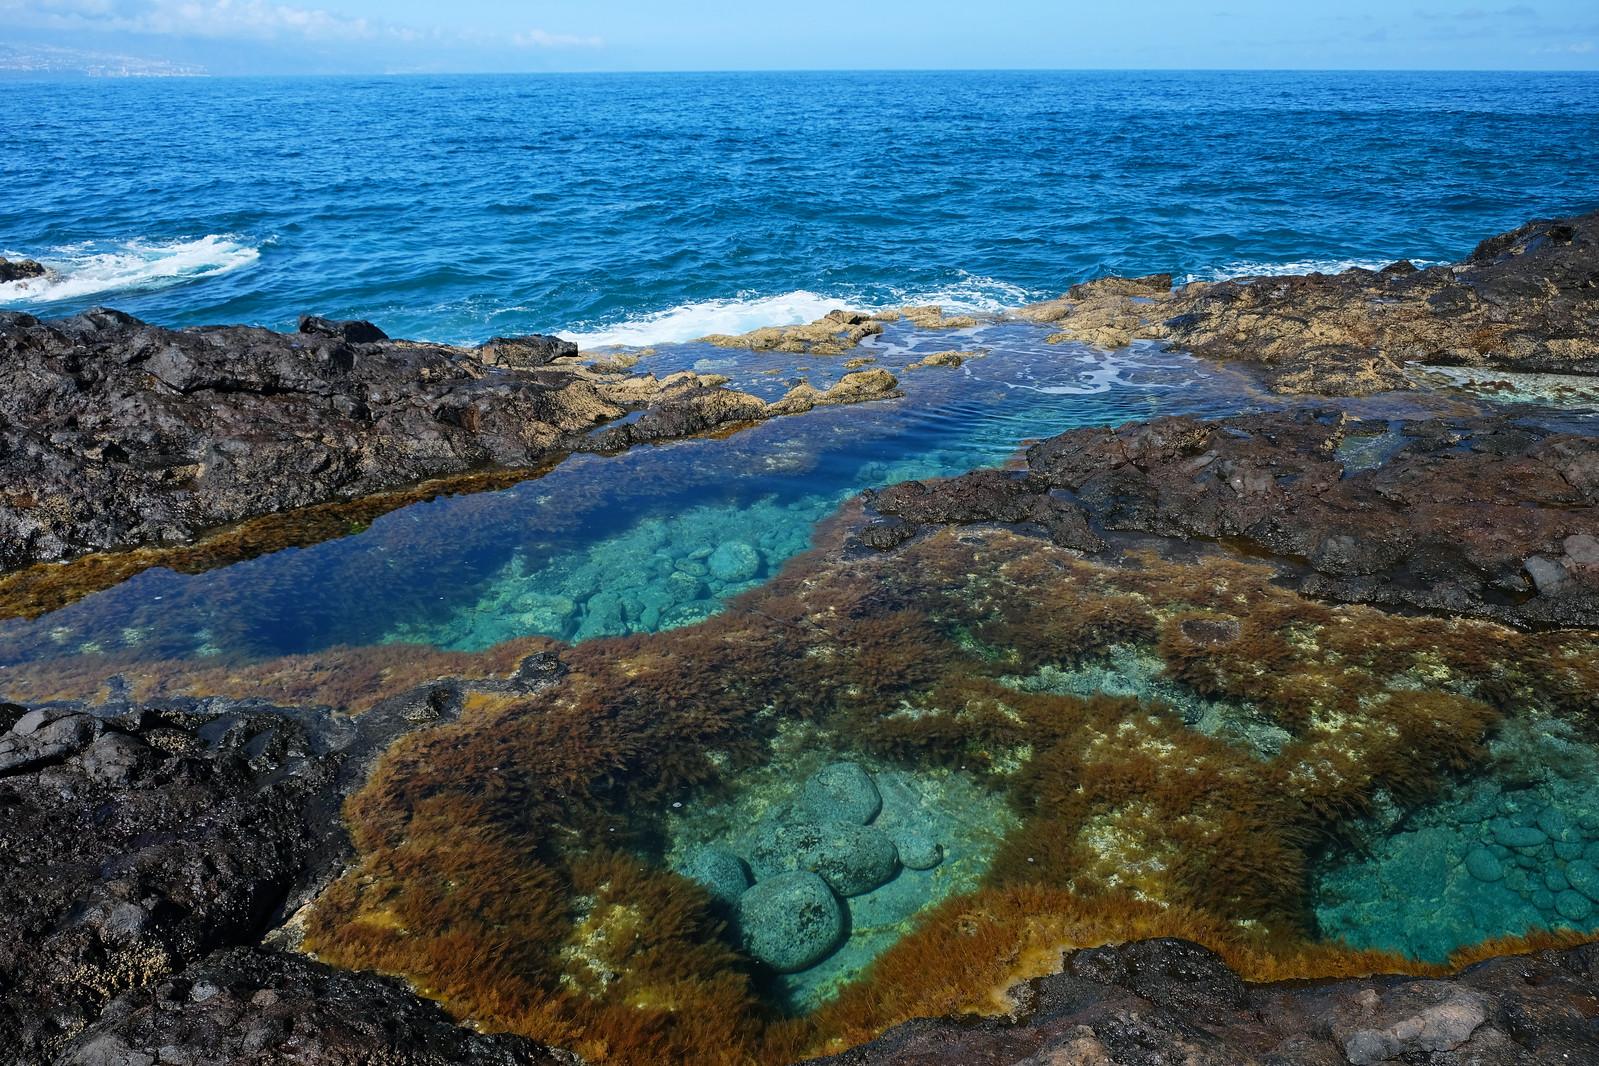 Mesa del Mar, Tenerife, Canary Islands, Spain